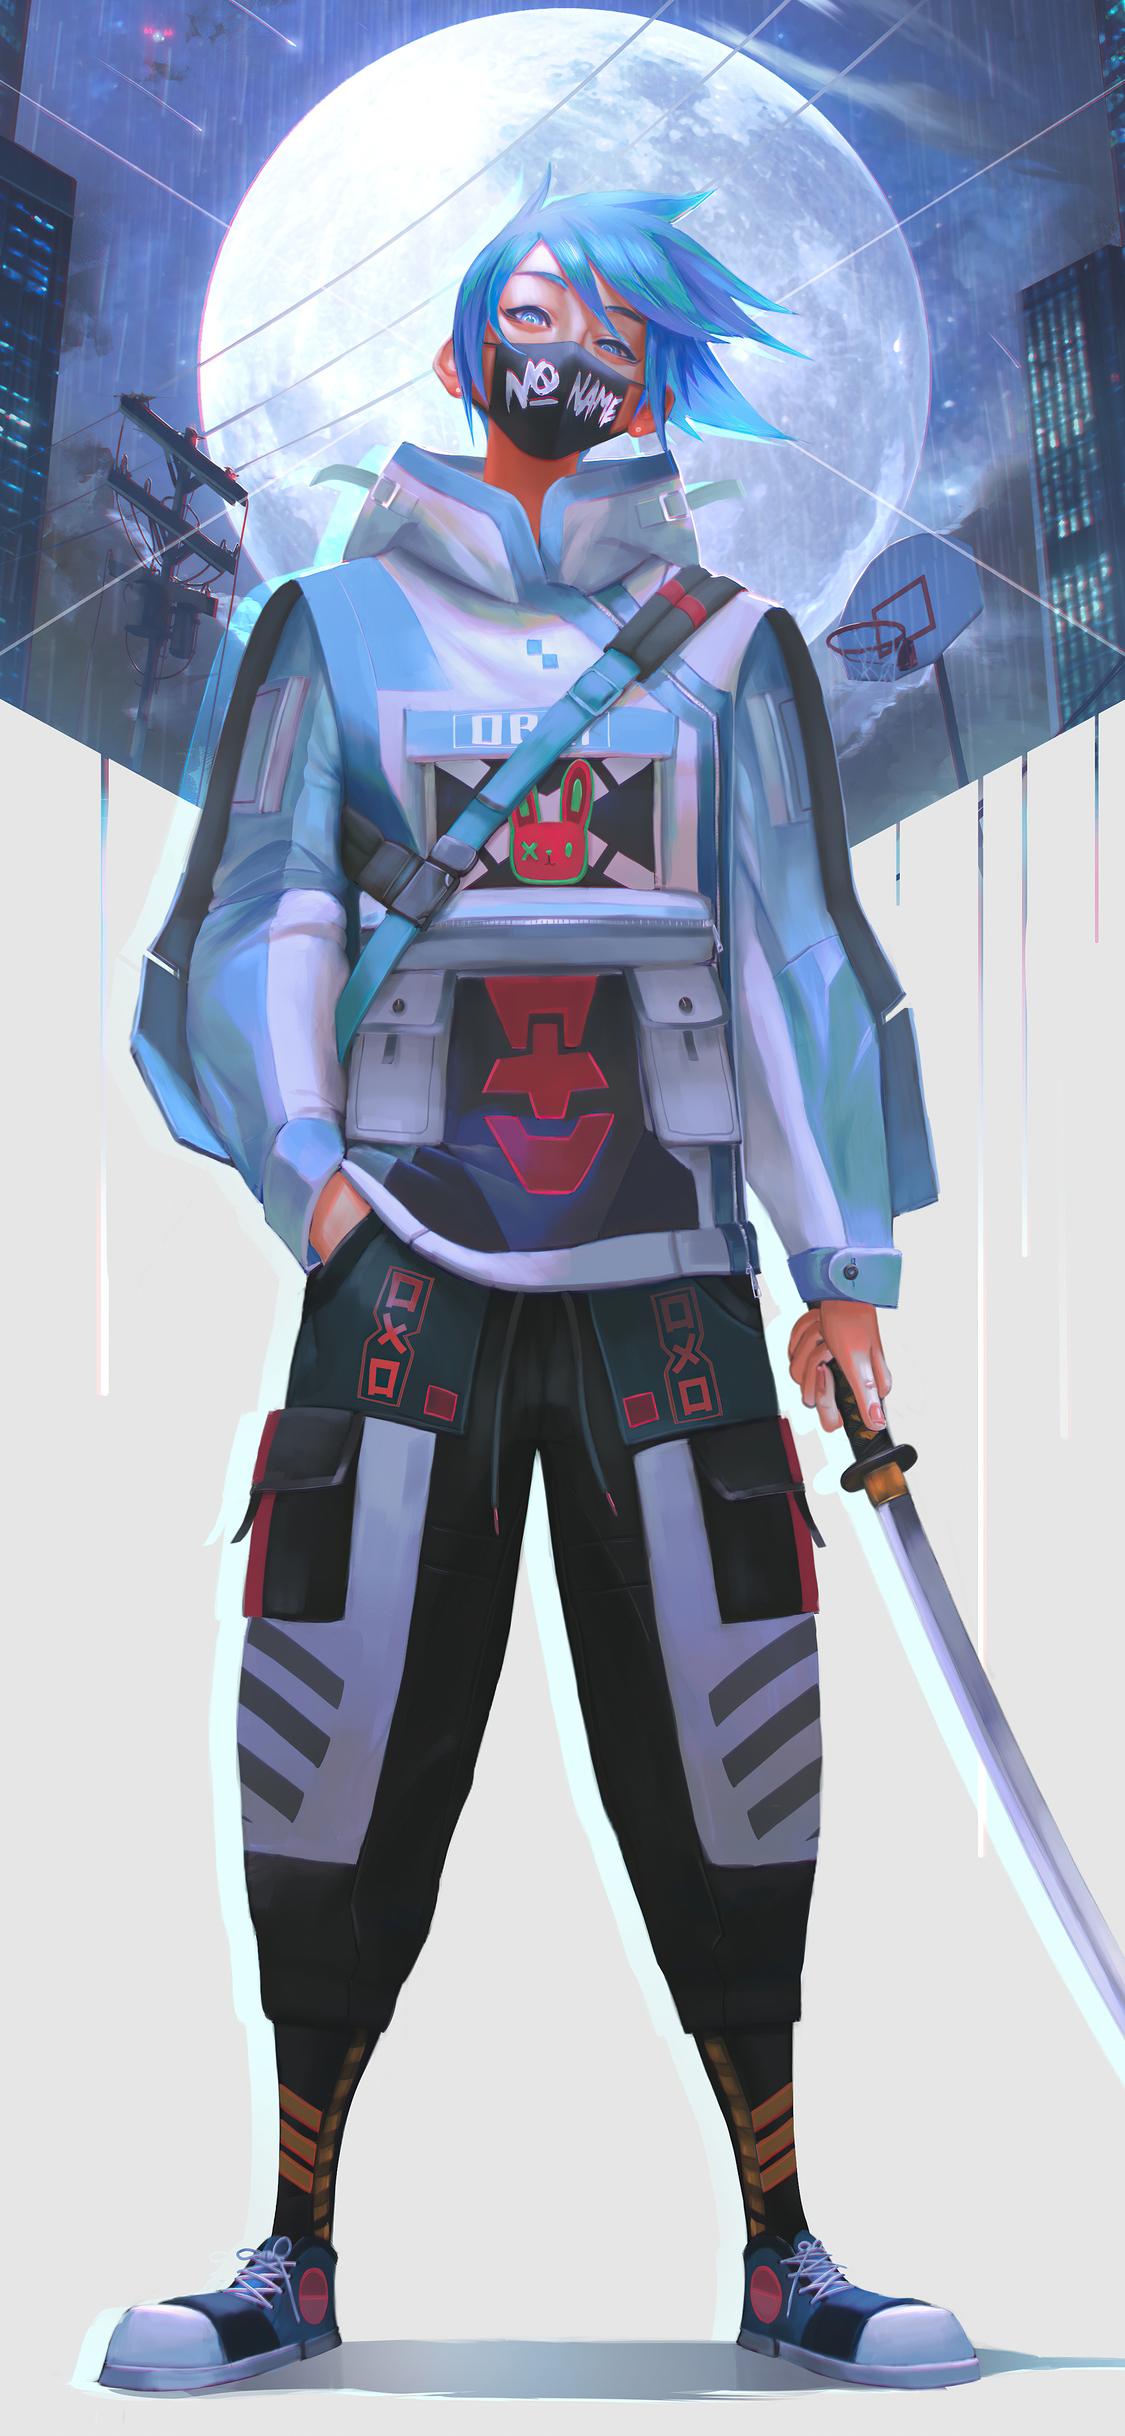 ninja-boy-with-sword-moon-4k-ex.jpg